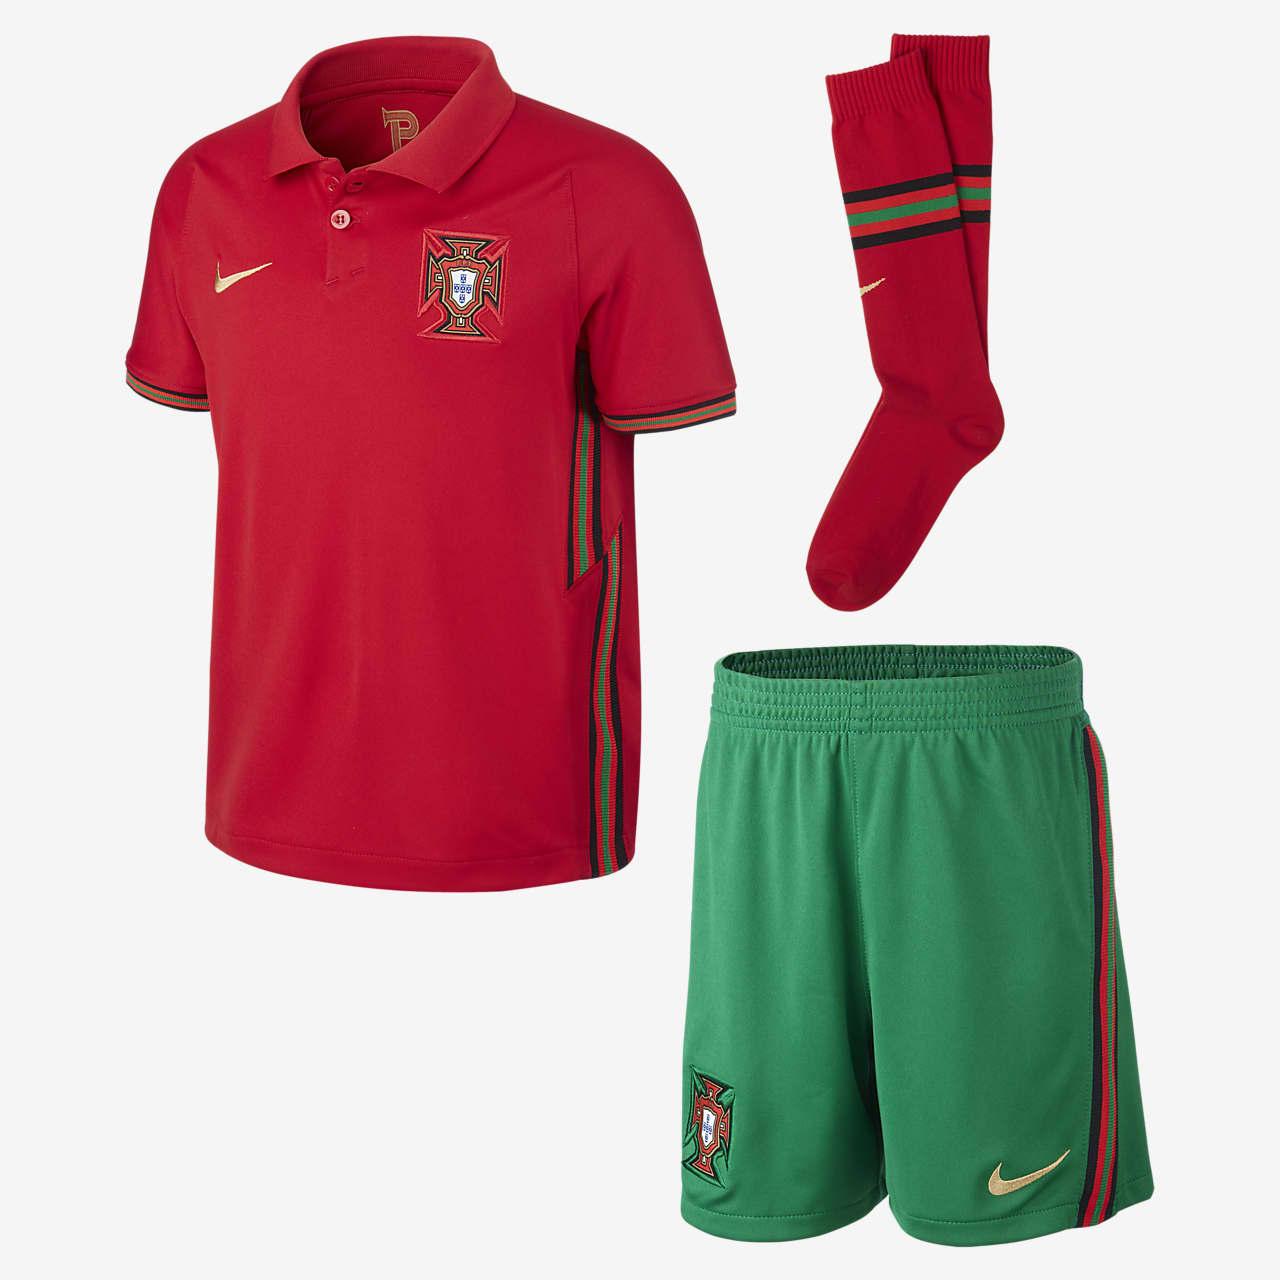 Kit de fútbol de local para niños talla pequeña Portugal 2020